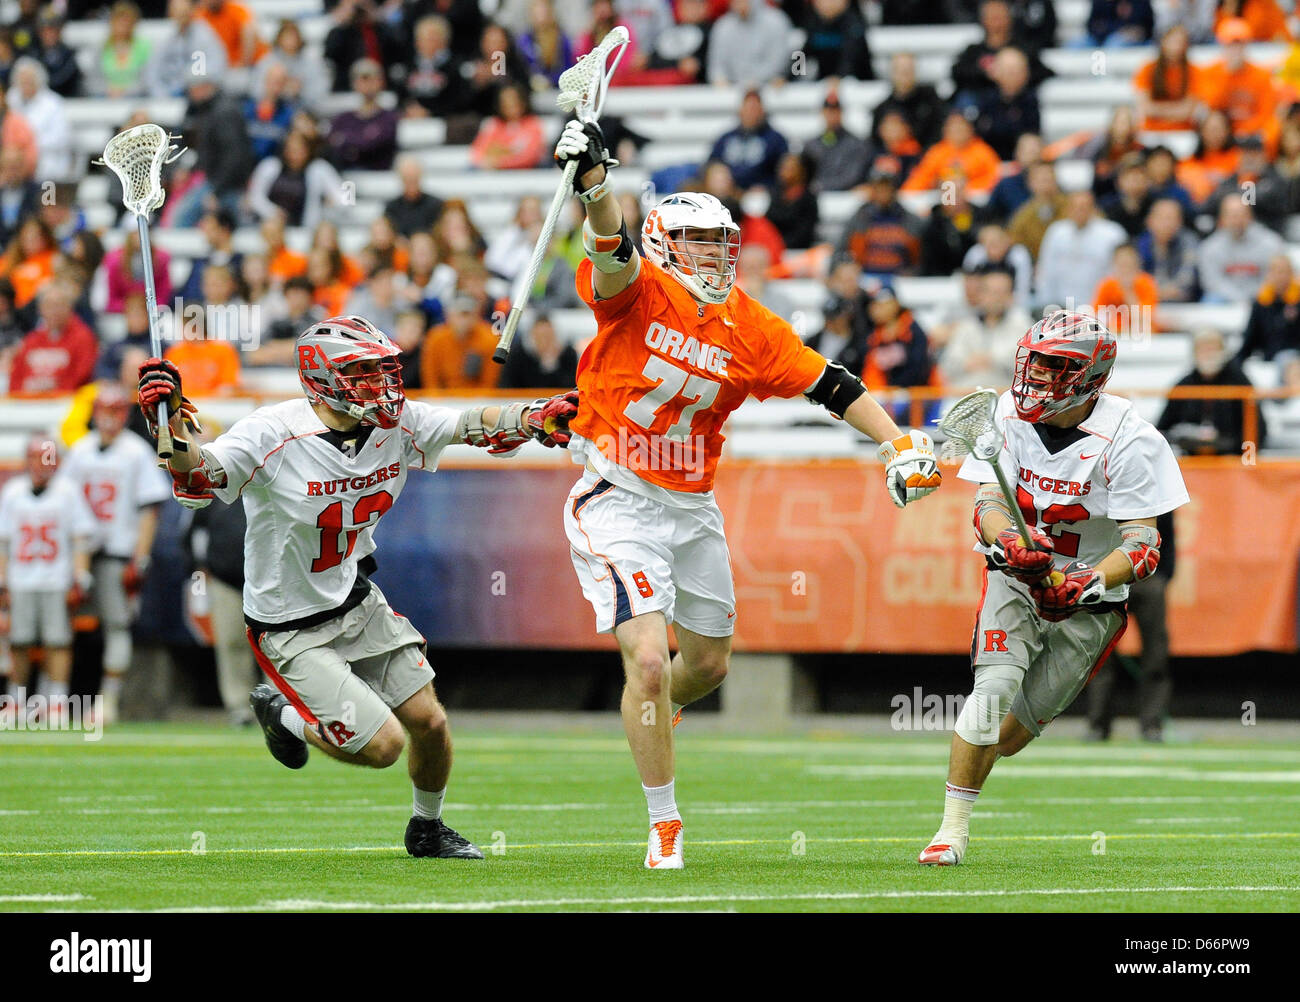 April 13, 2013 - Syracuse, New York, USA - April 13, 2013: Syracuse Orange midfielder Henry Schoonmaker #77 runs - Stock Image